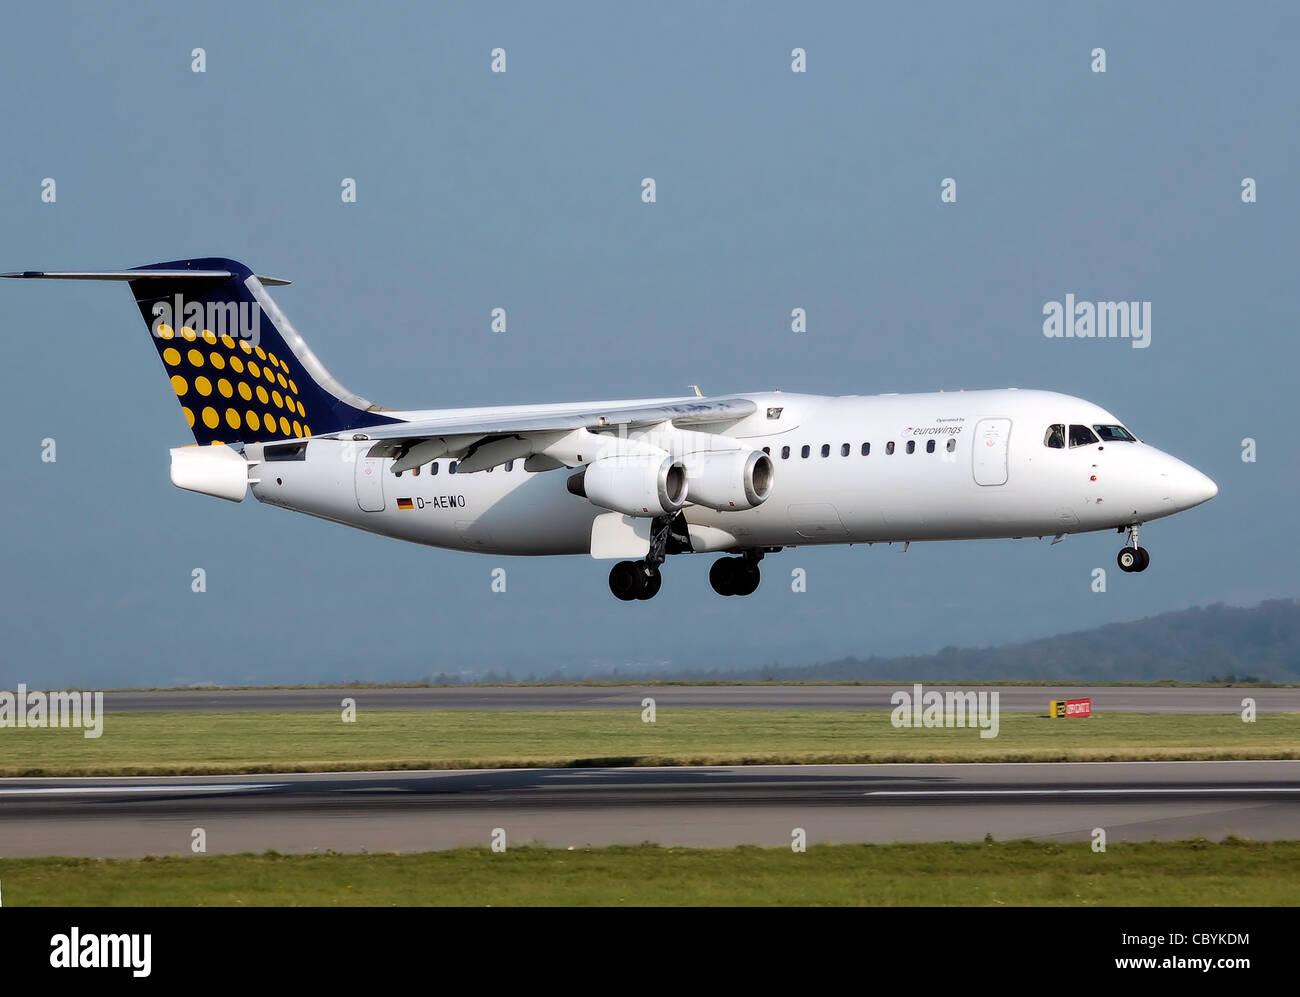 Lufthansa Regional (Eurowings) BAe 146-300 (D-AEWO) lands at Bristol International Airport, England. - Stock Image